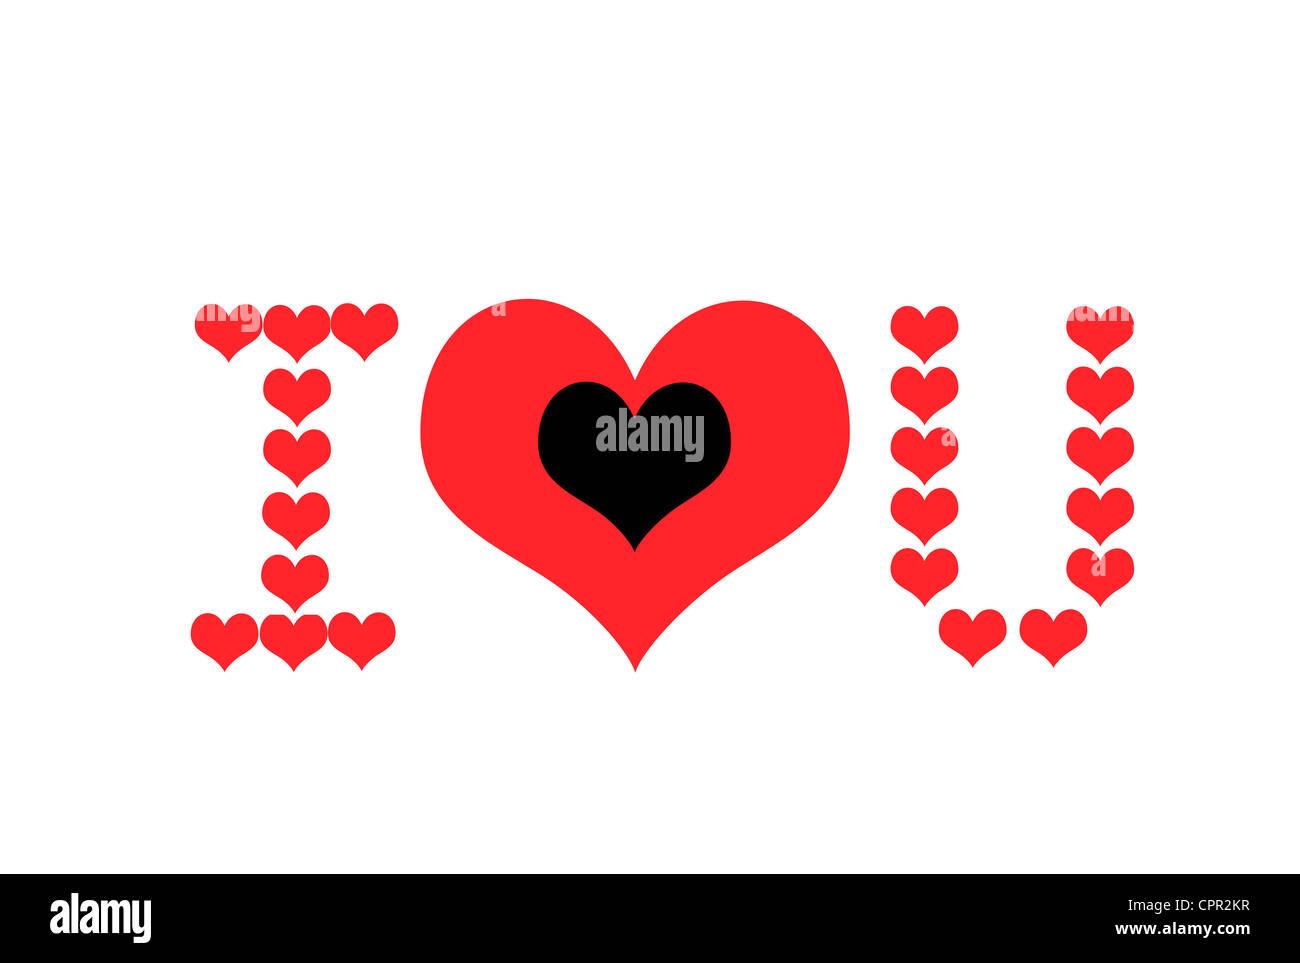 Symbolic representation of i love you or i heart you stock photo symbolic representation of i love you or i heart you spiritdancerdesigns Images